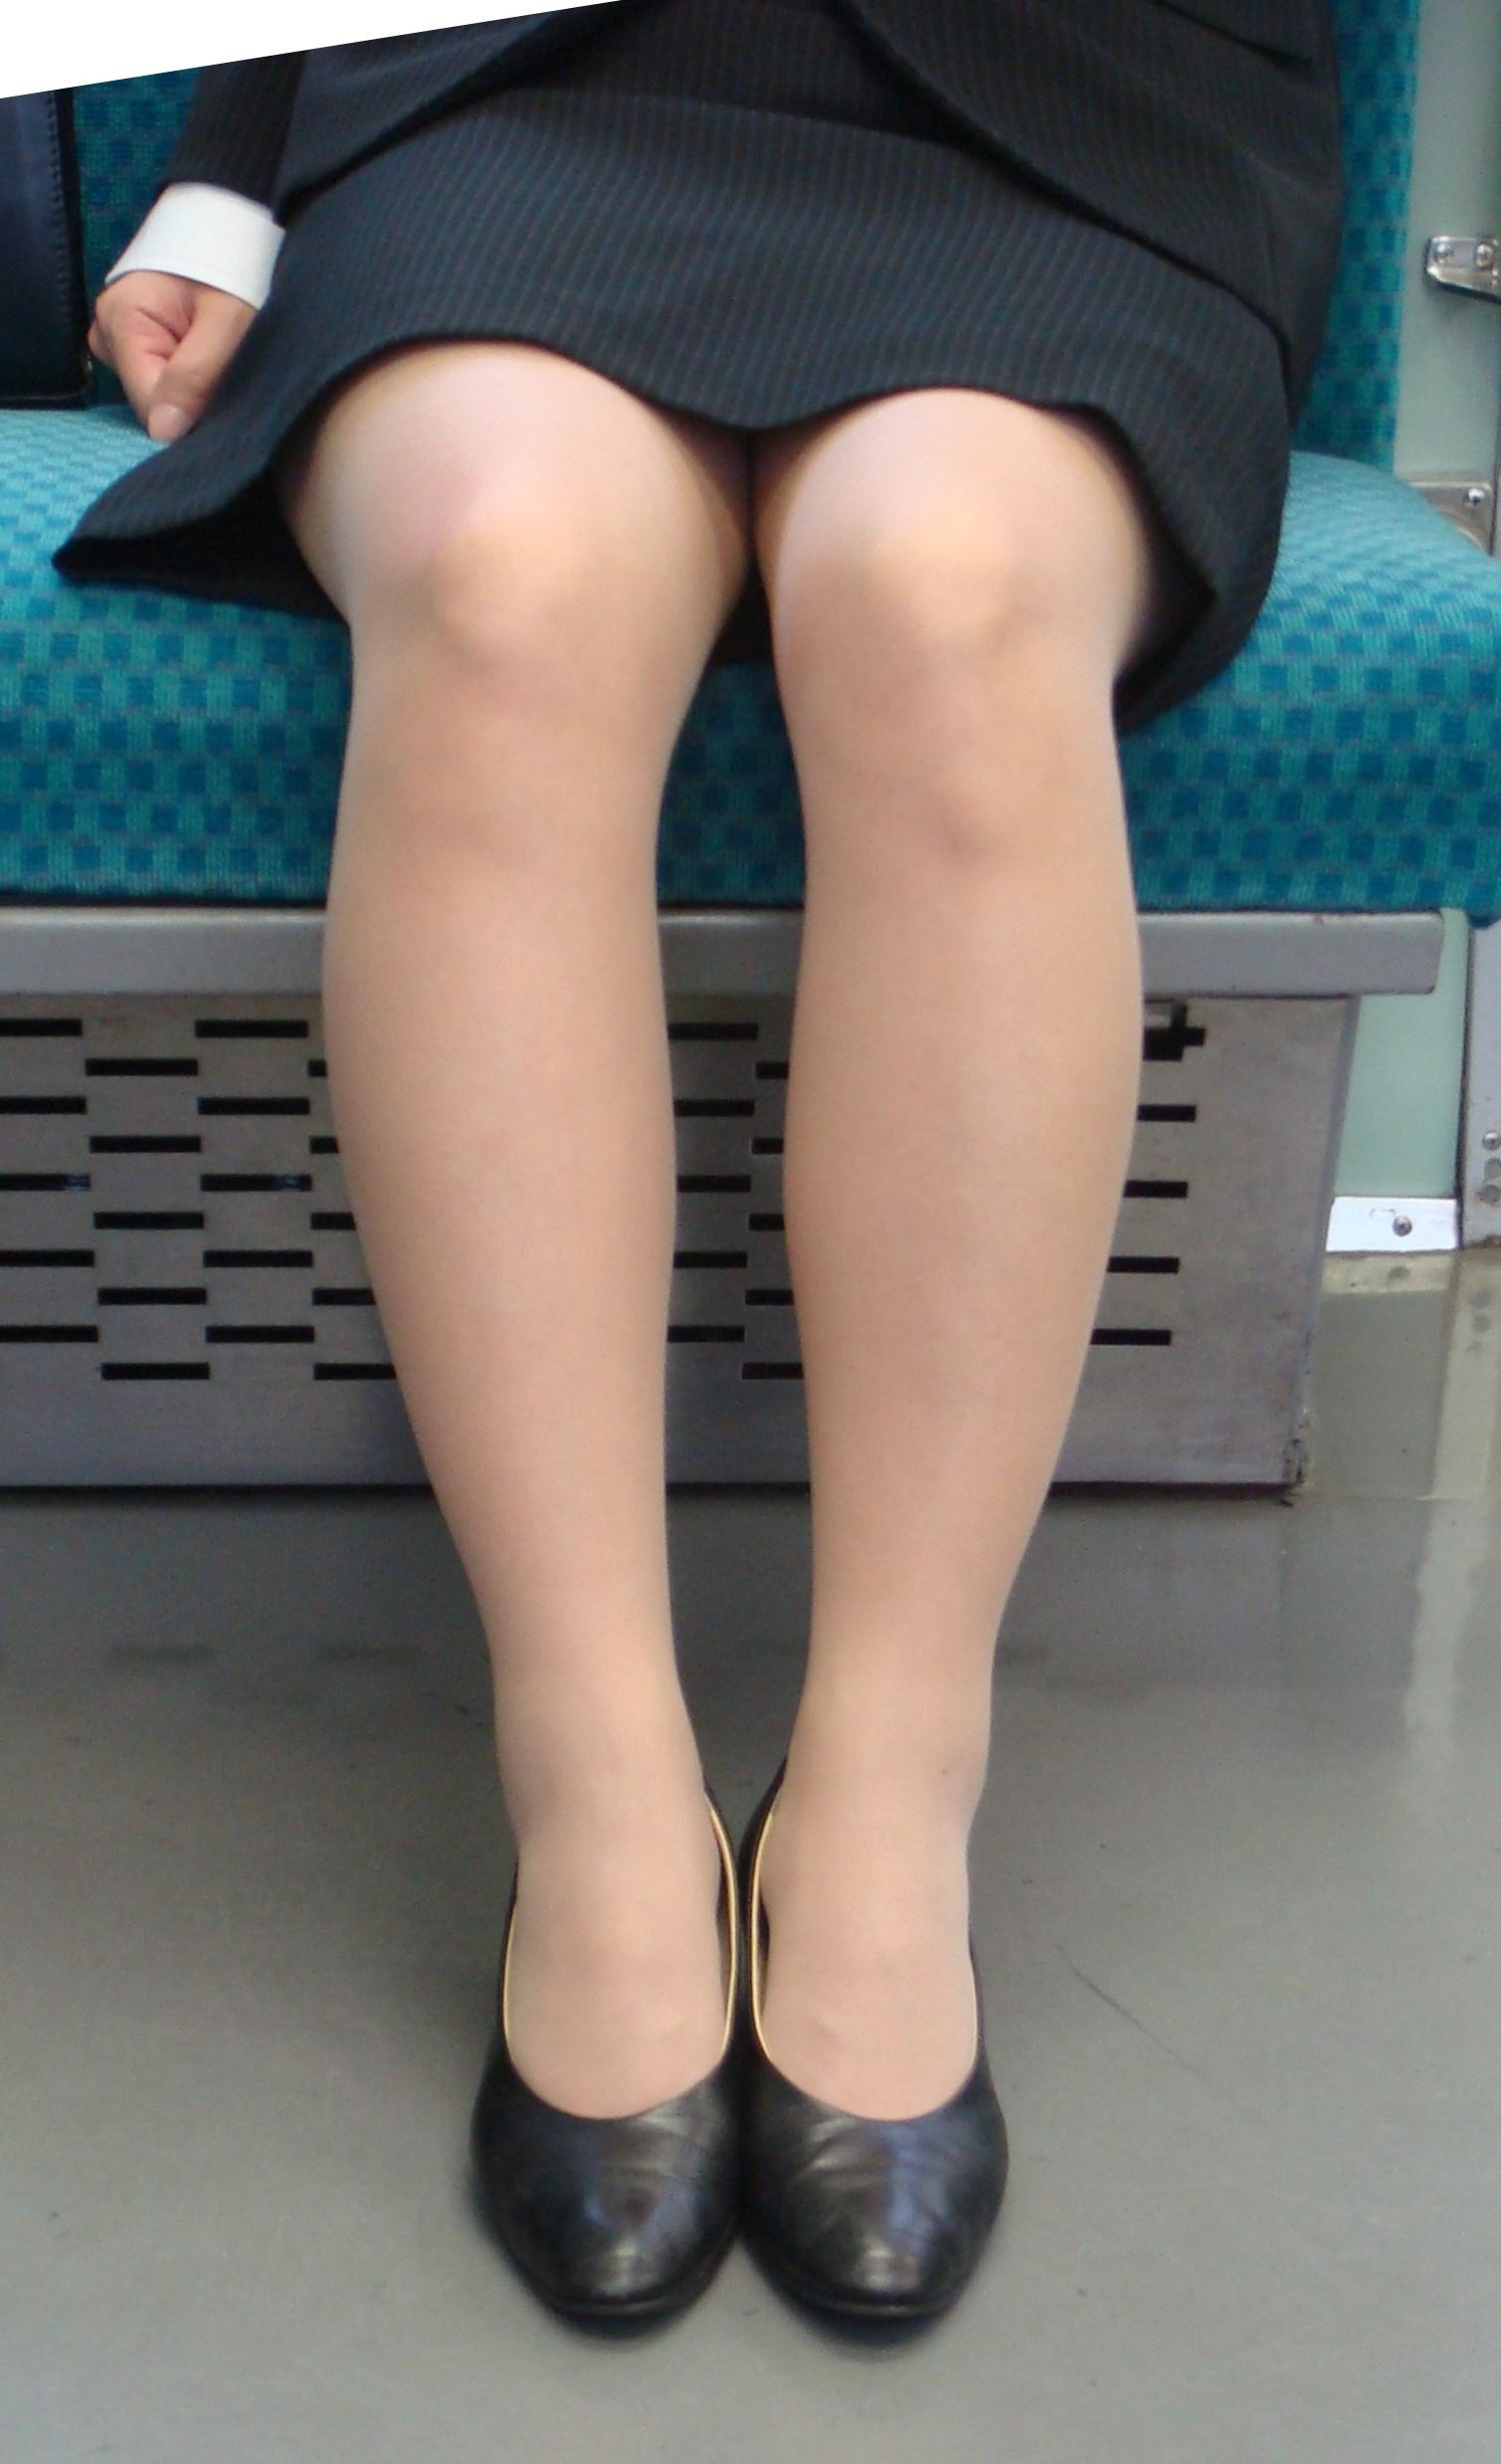 OL_美脚_パンスト_電車_盗撮_エロ画像_19